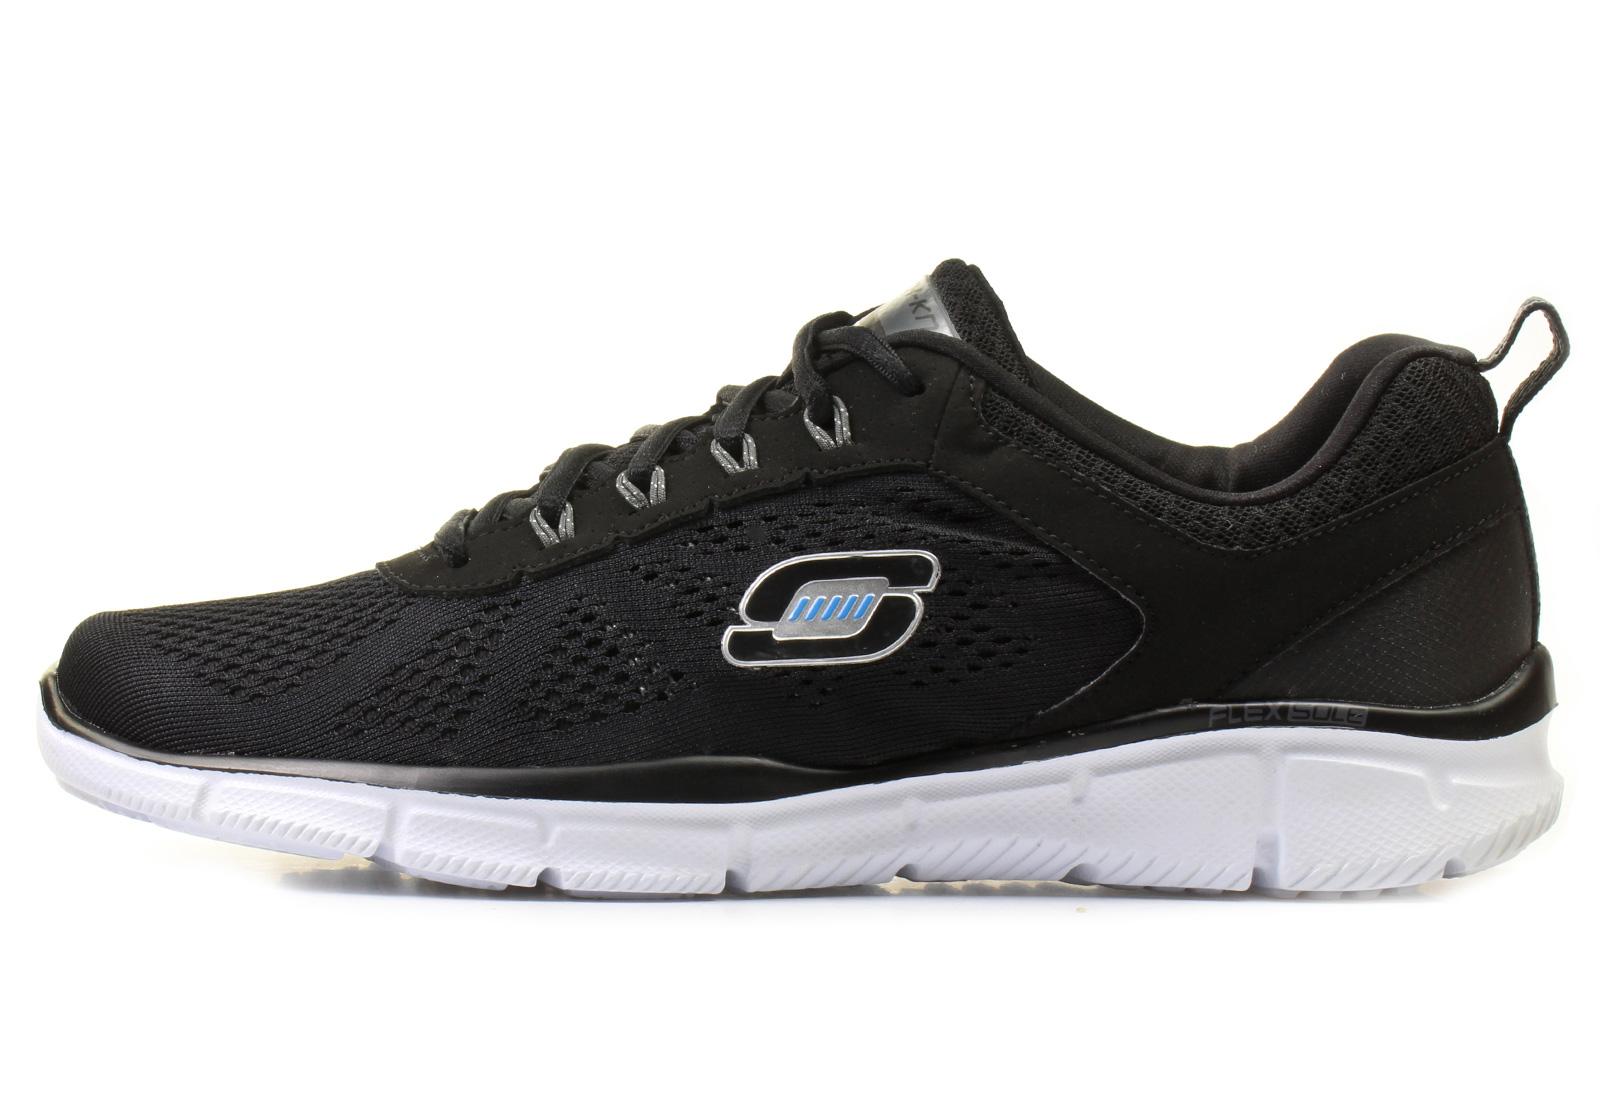 Skechers Shoes - Deal Maker - 51358-bkw